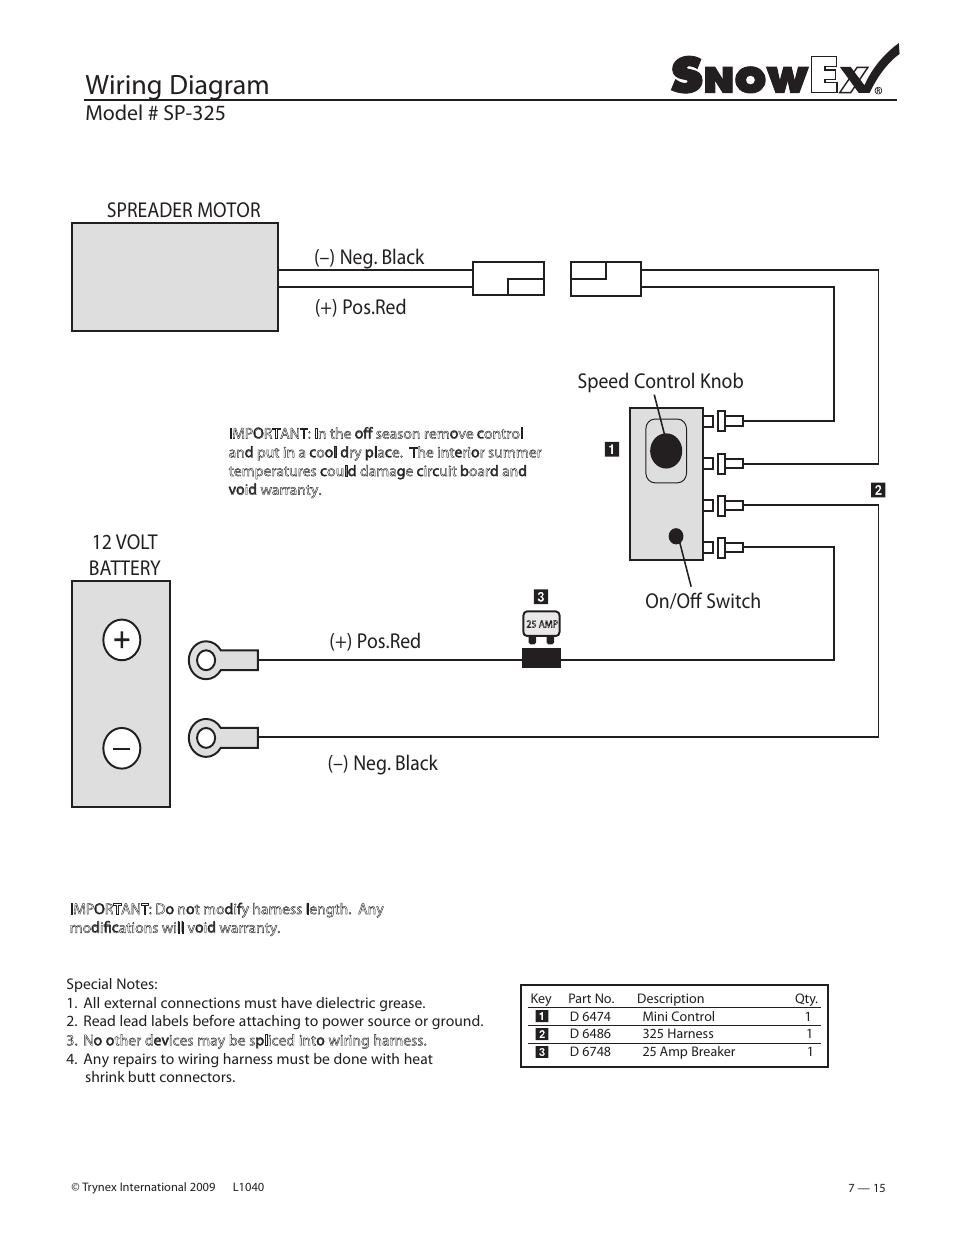 medium resolution of snowex wiring diagram 2500 books of wiring diagram u2022 snowex salt spreaders snowex 8500 wiring diagram